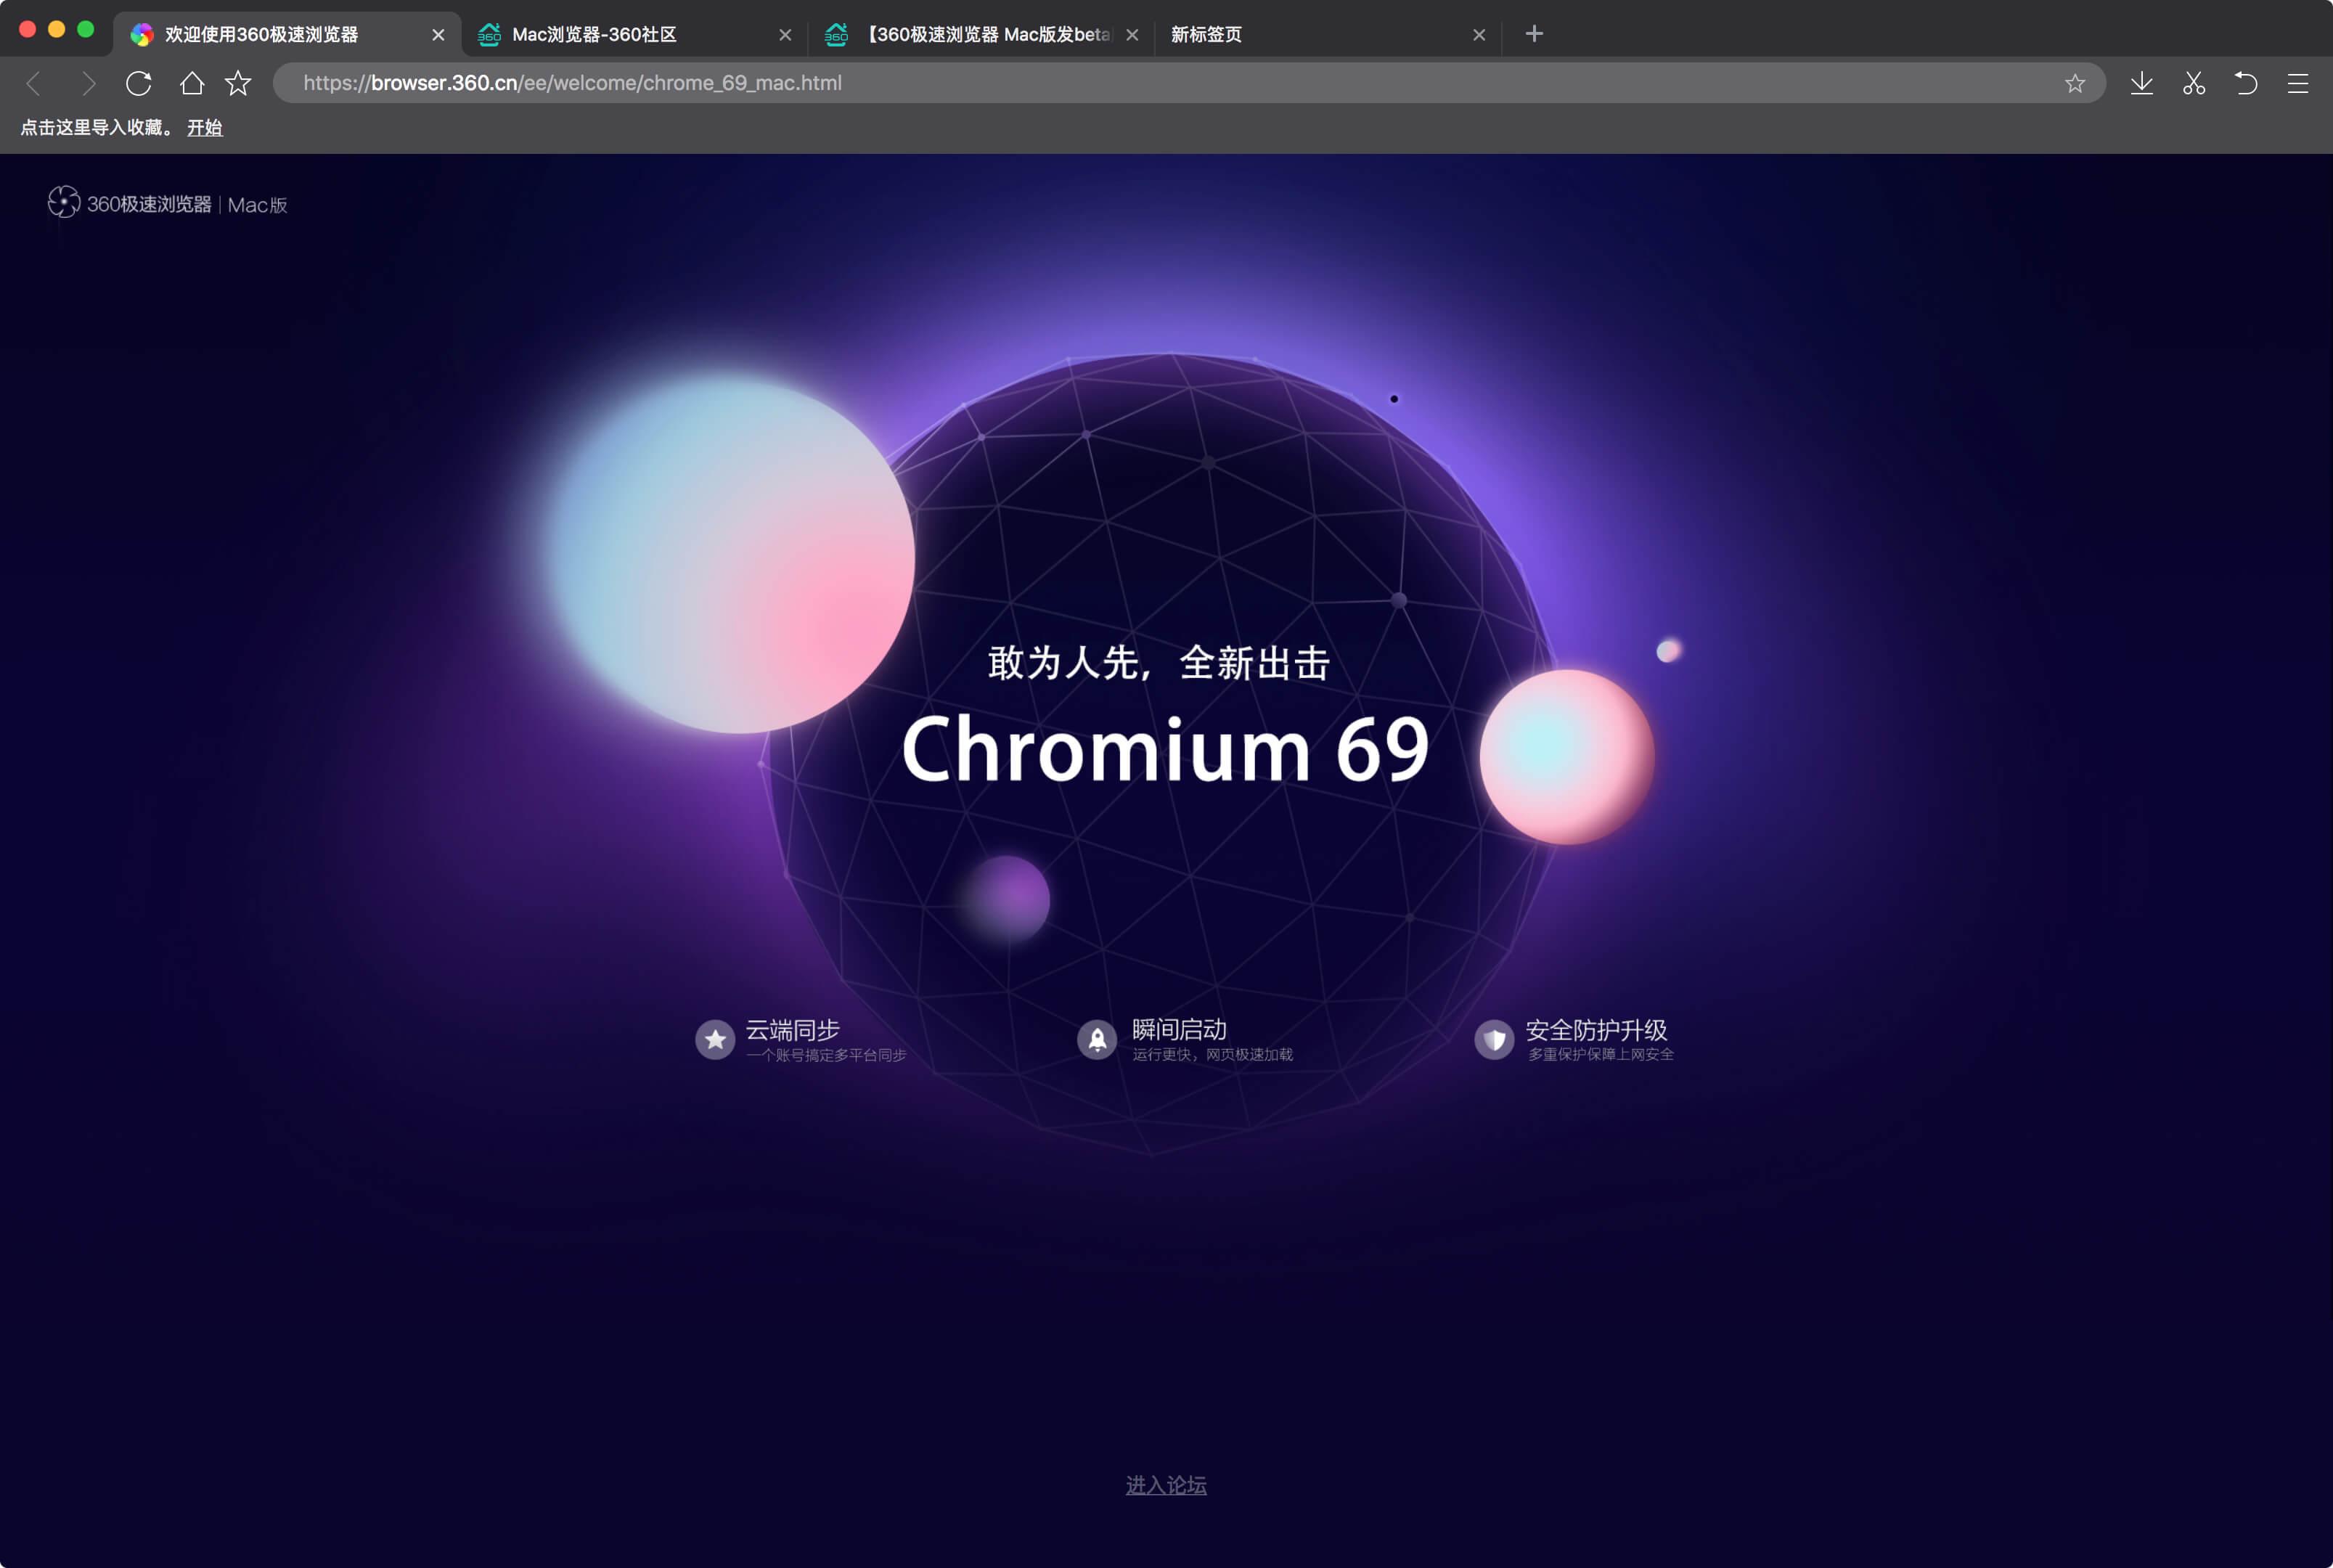 360极速浏览器 for mac 1.0.1505.0.中文版